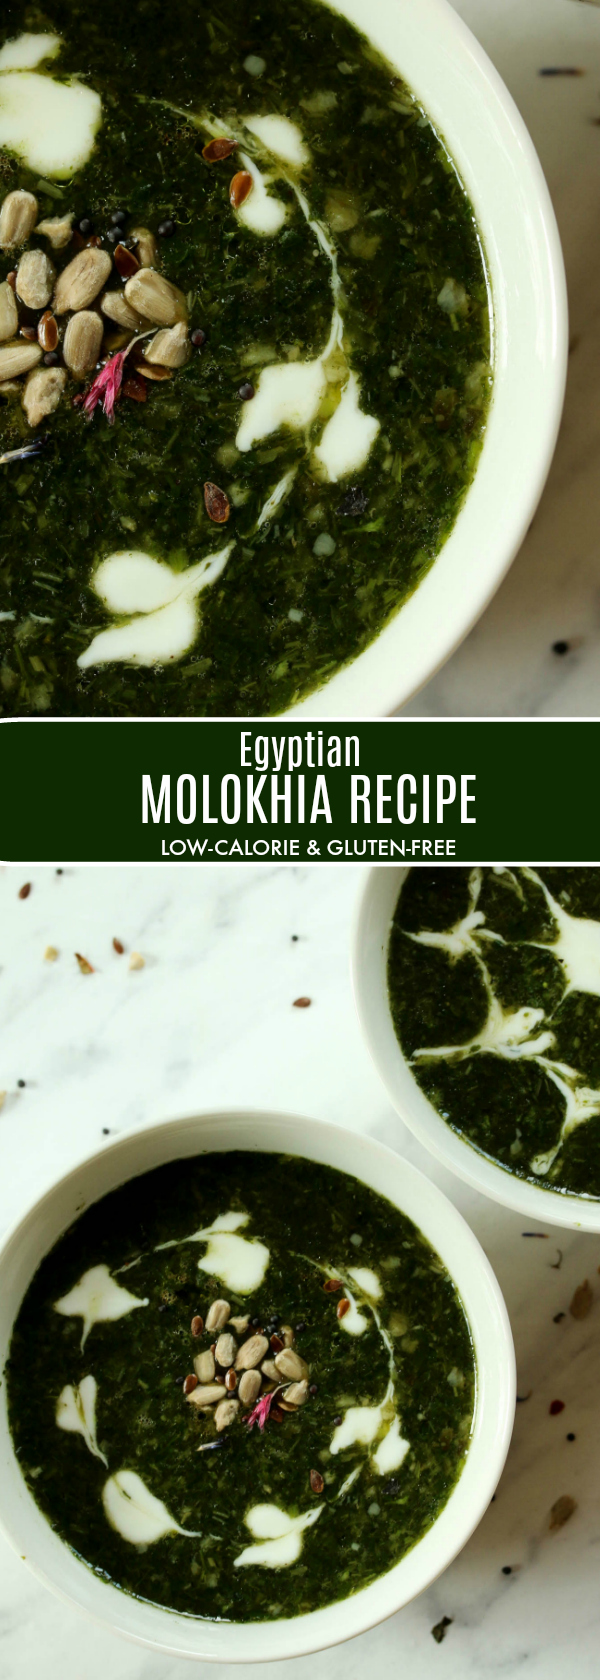 molokhia-foodsfromafrica